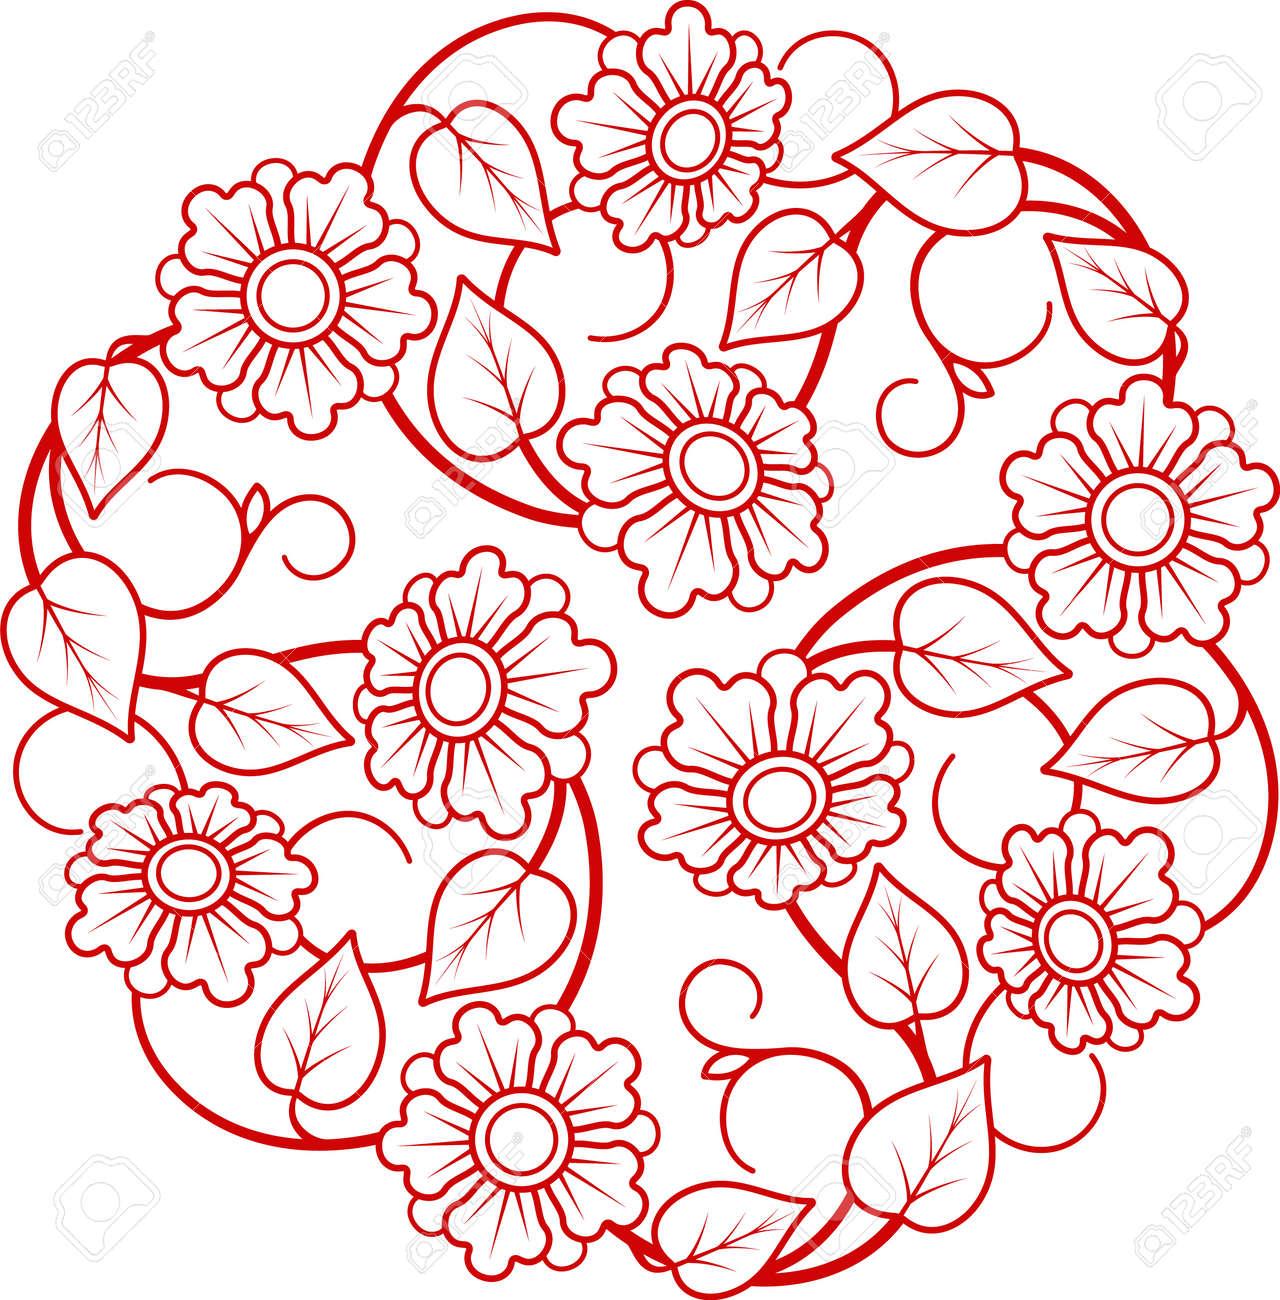 Round ornamental modern flower circle floral design ornament leaf luxury emblem - 170994884